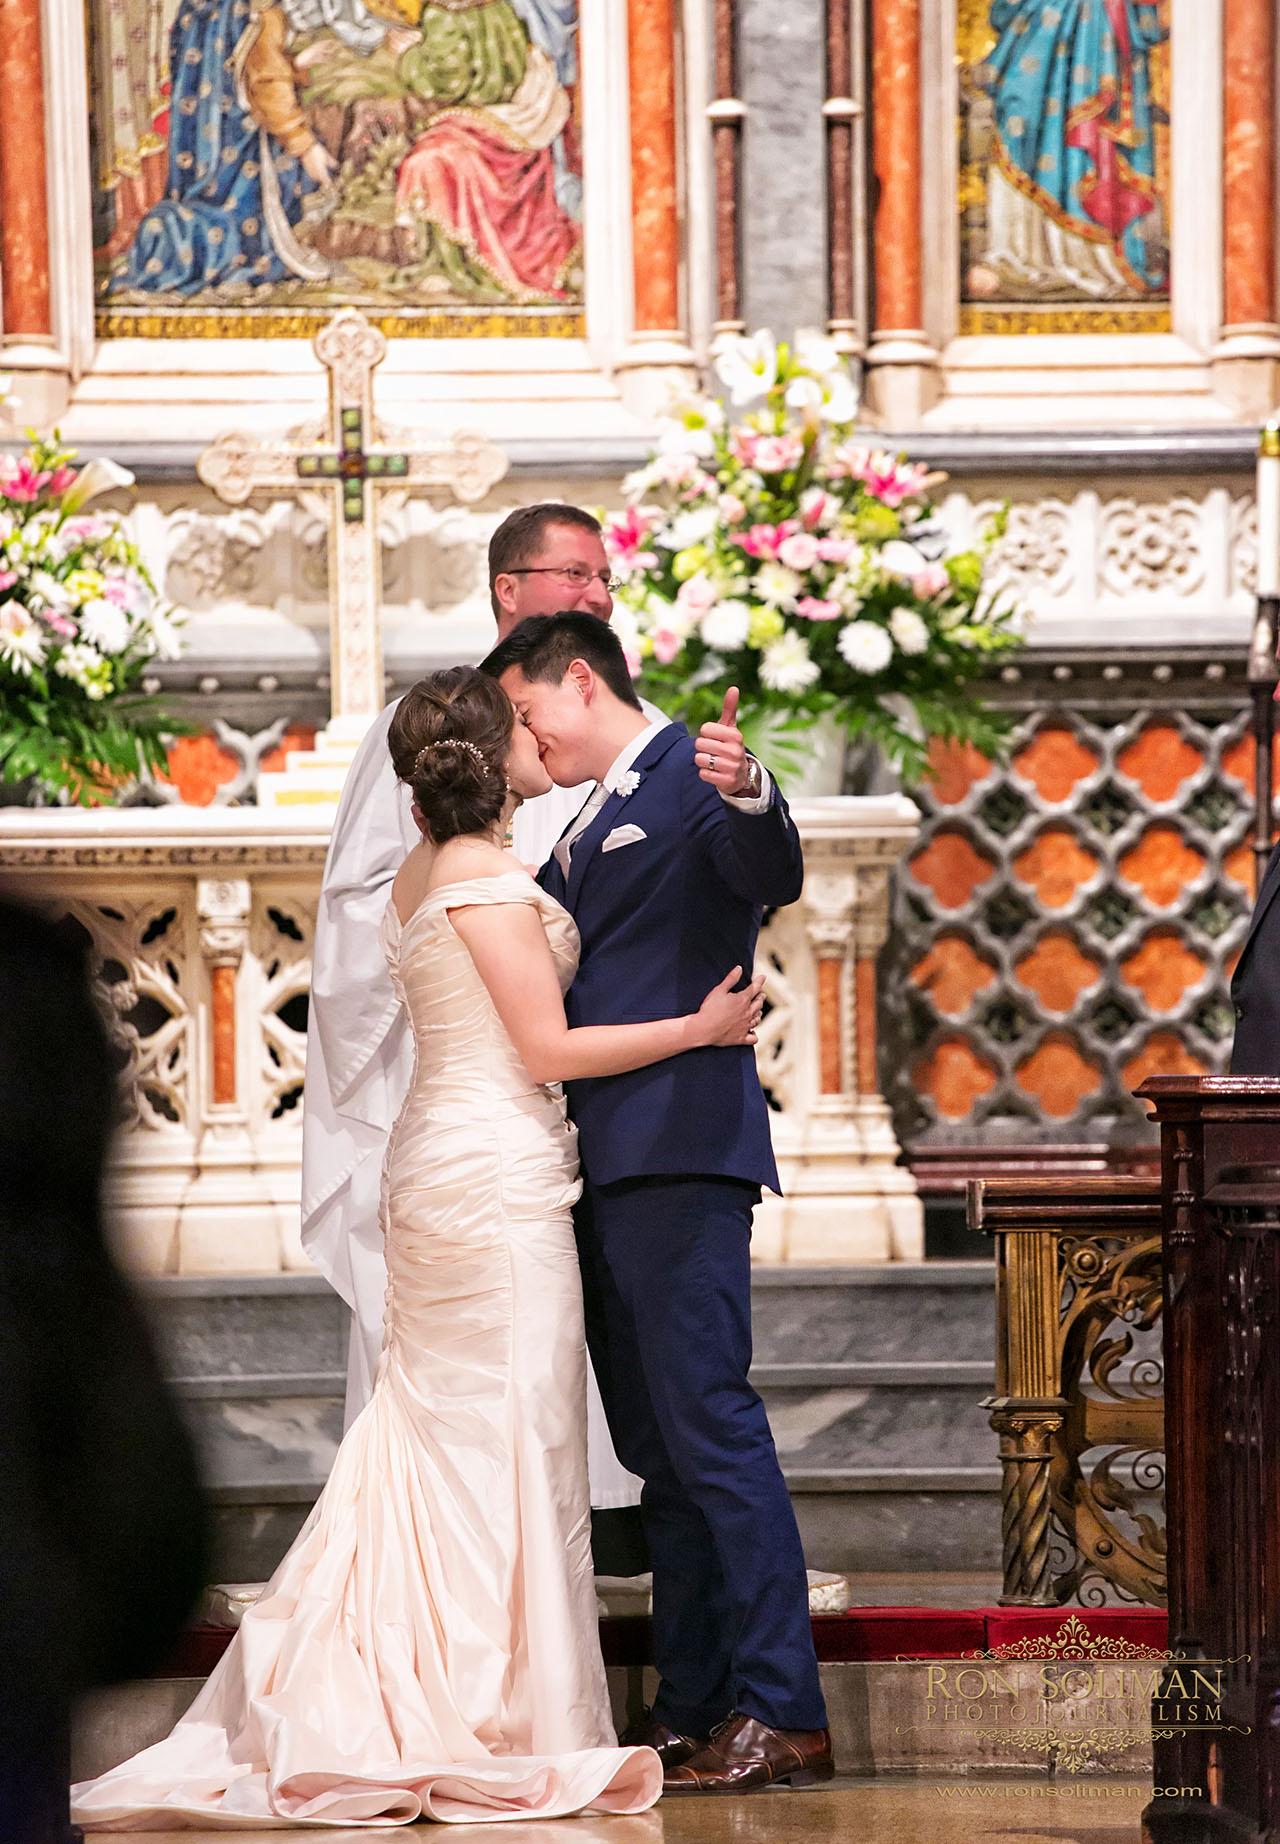 LIGHTHOUSE CHELSEA PIERS WEDDING 15